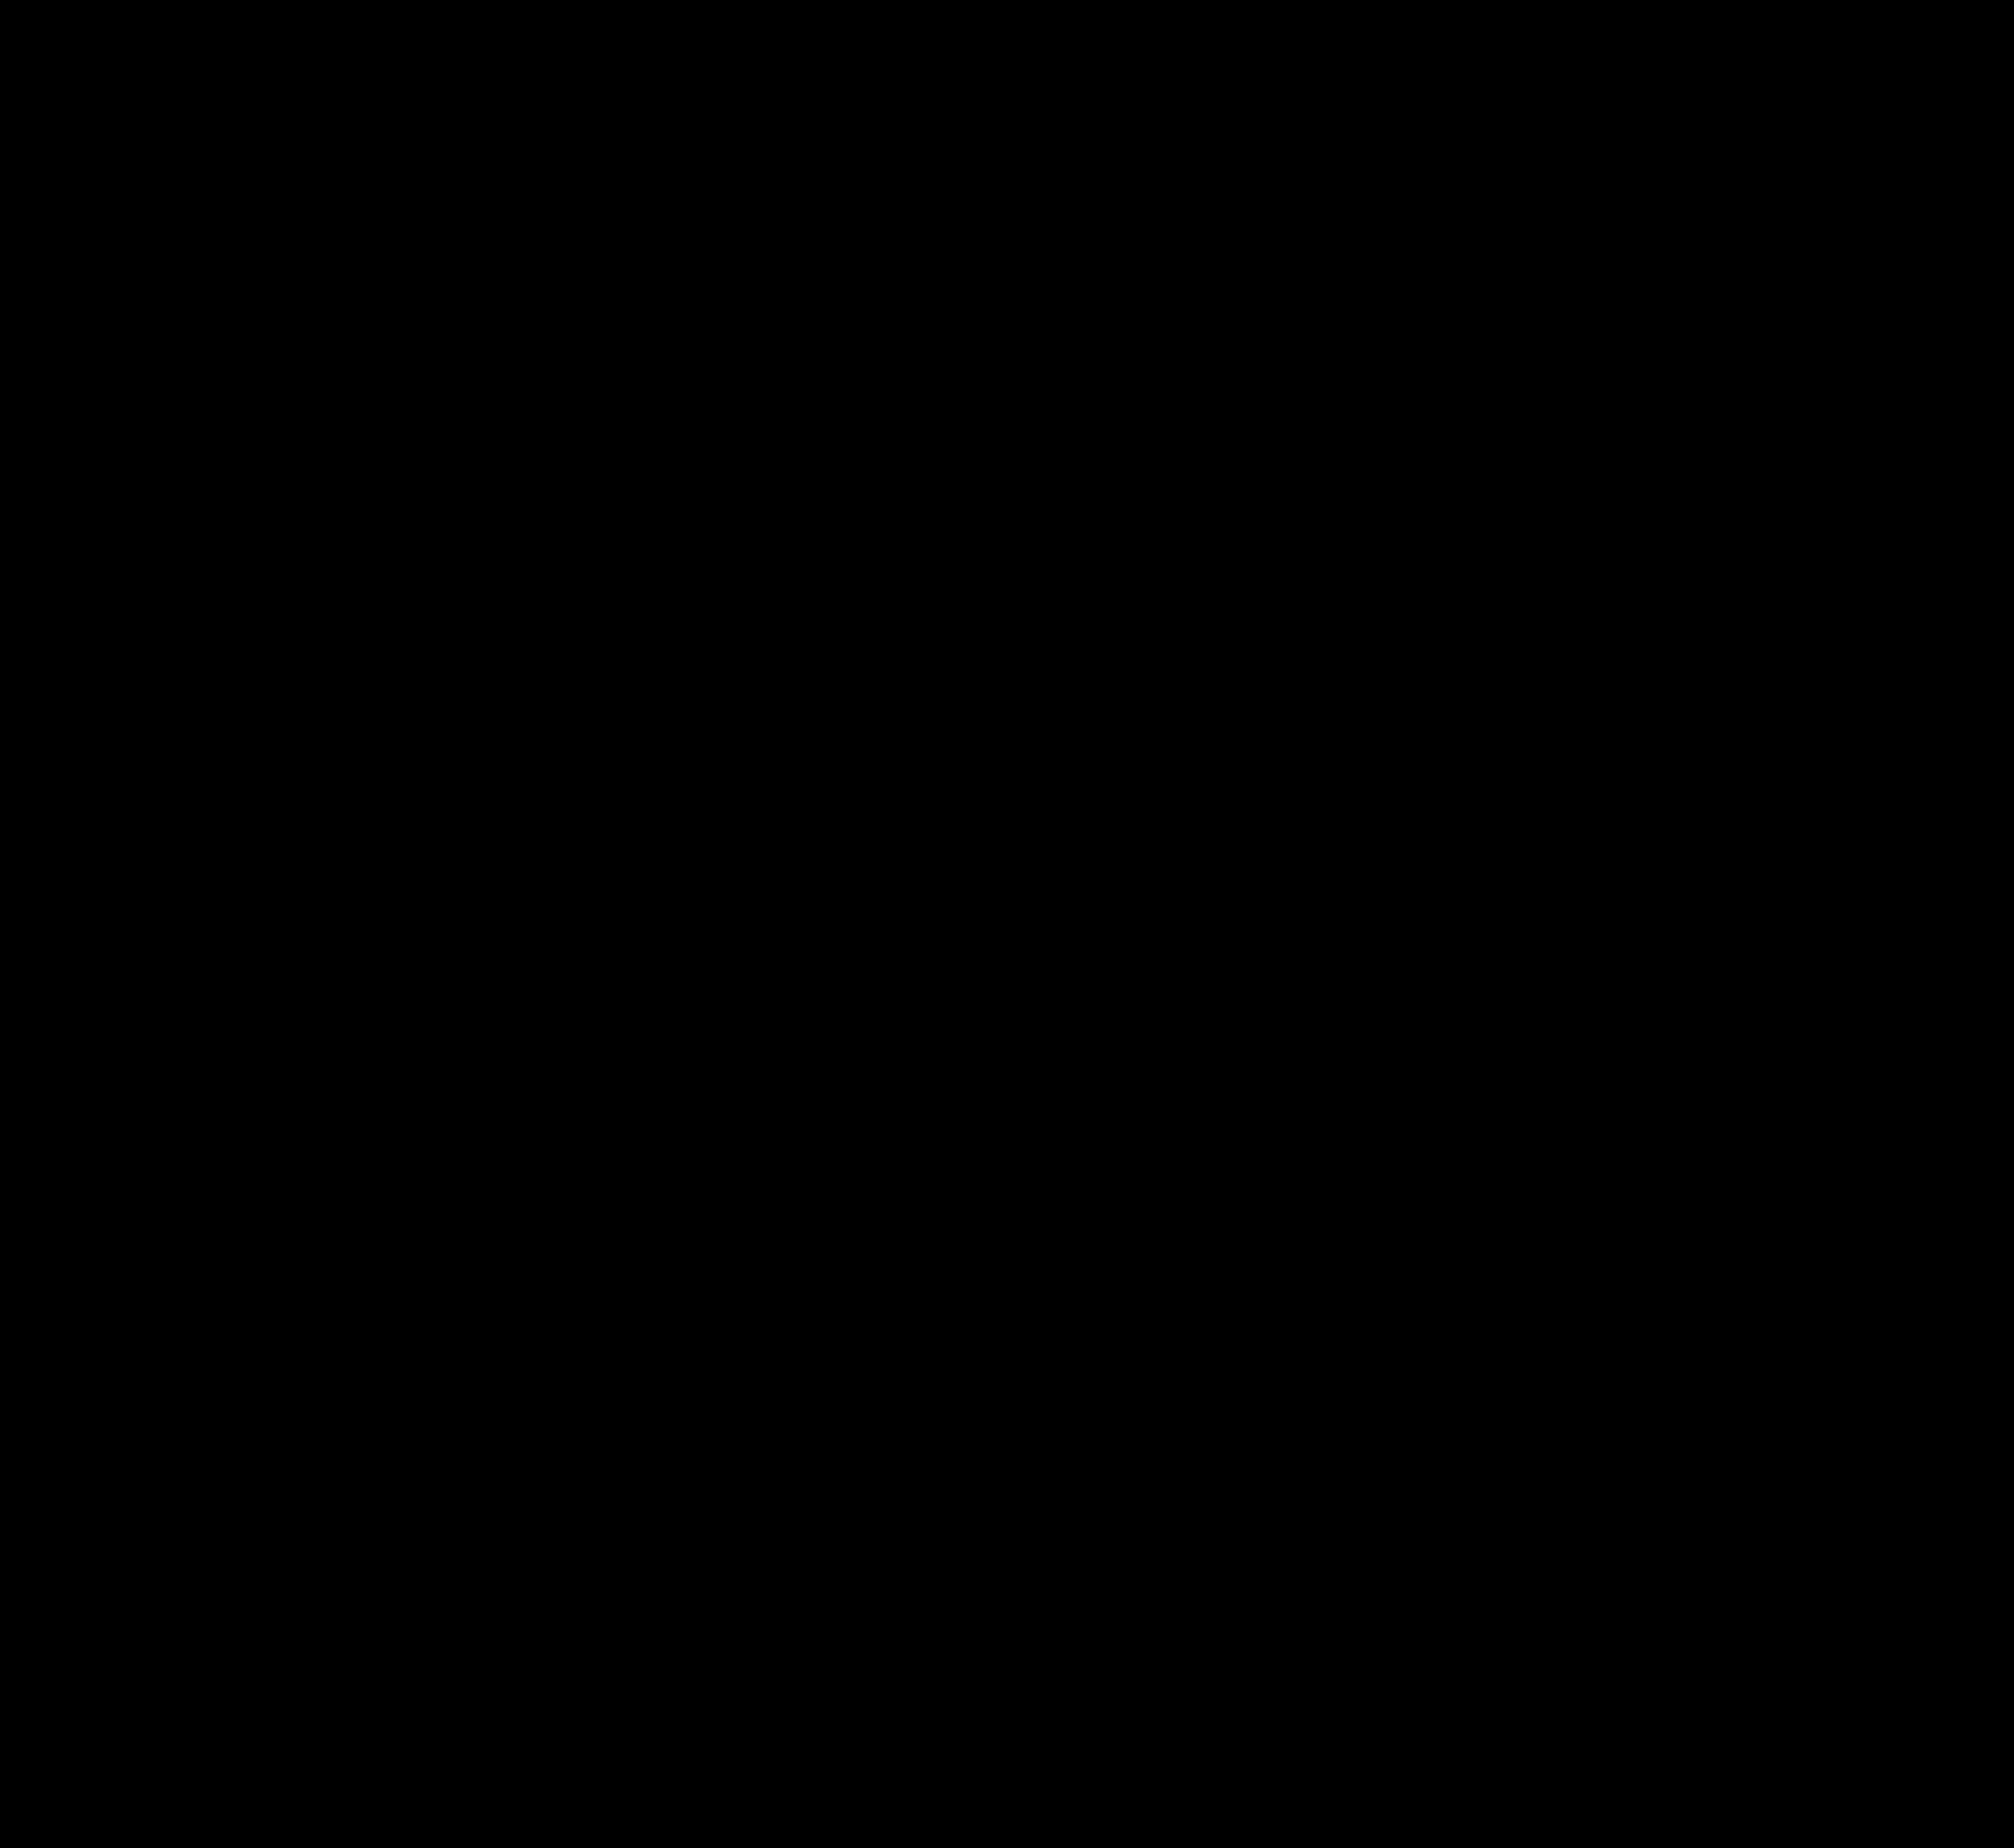 Heart silhouette clipart clip art black and white download Clipart - Decorative Ornamental Heart Silhouette clip art black and white download